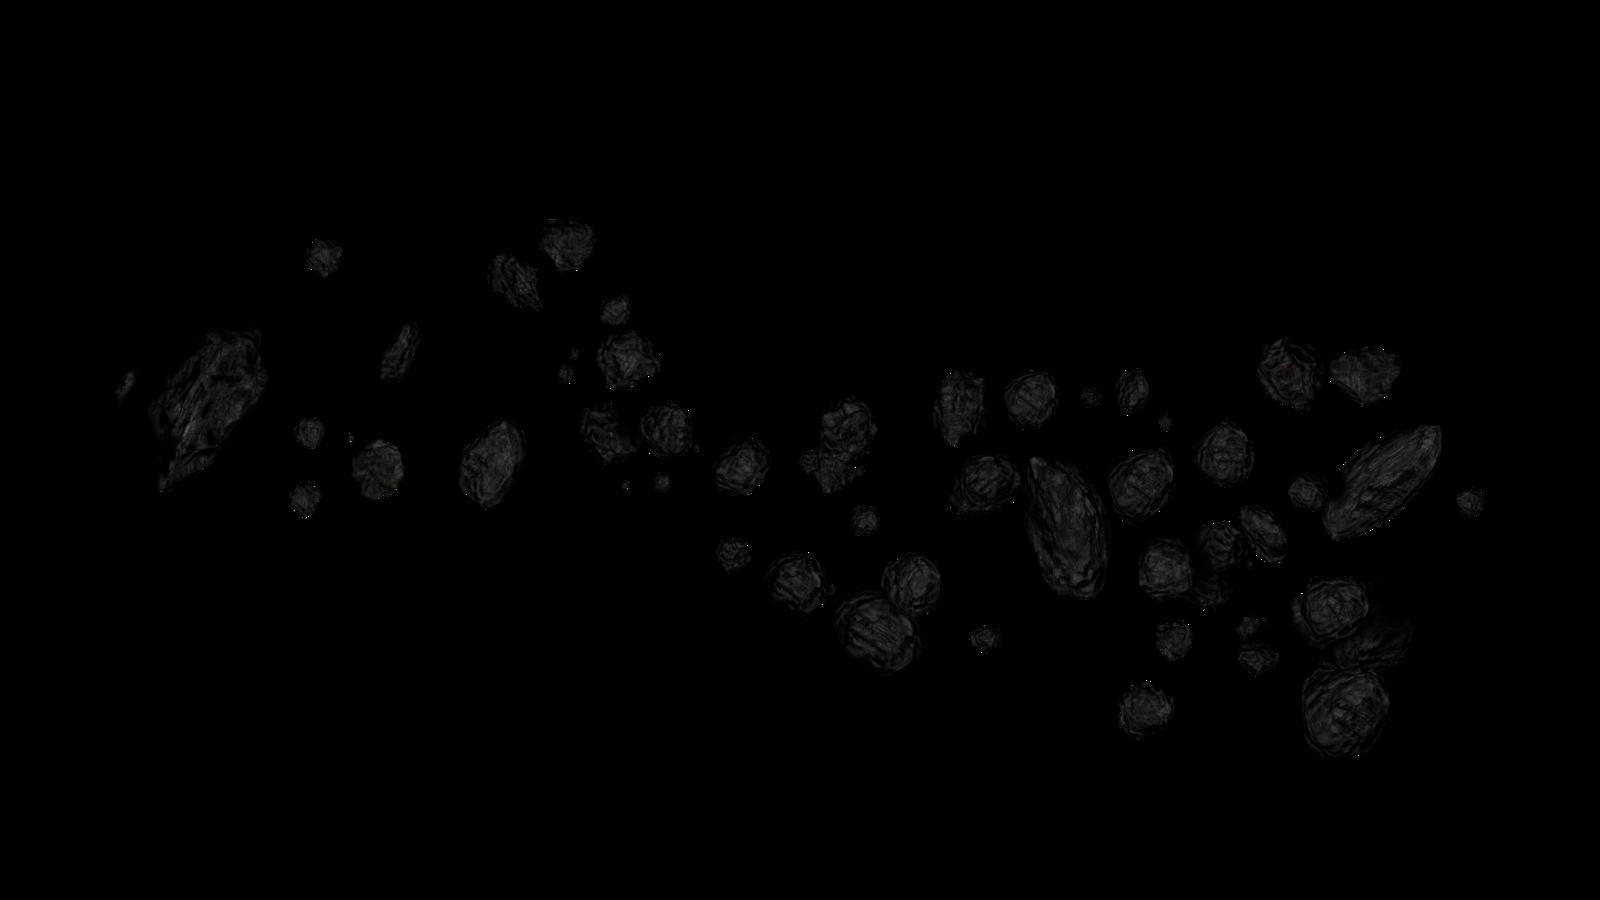 Asteroids Asteroid belt Clip art.